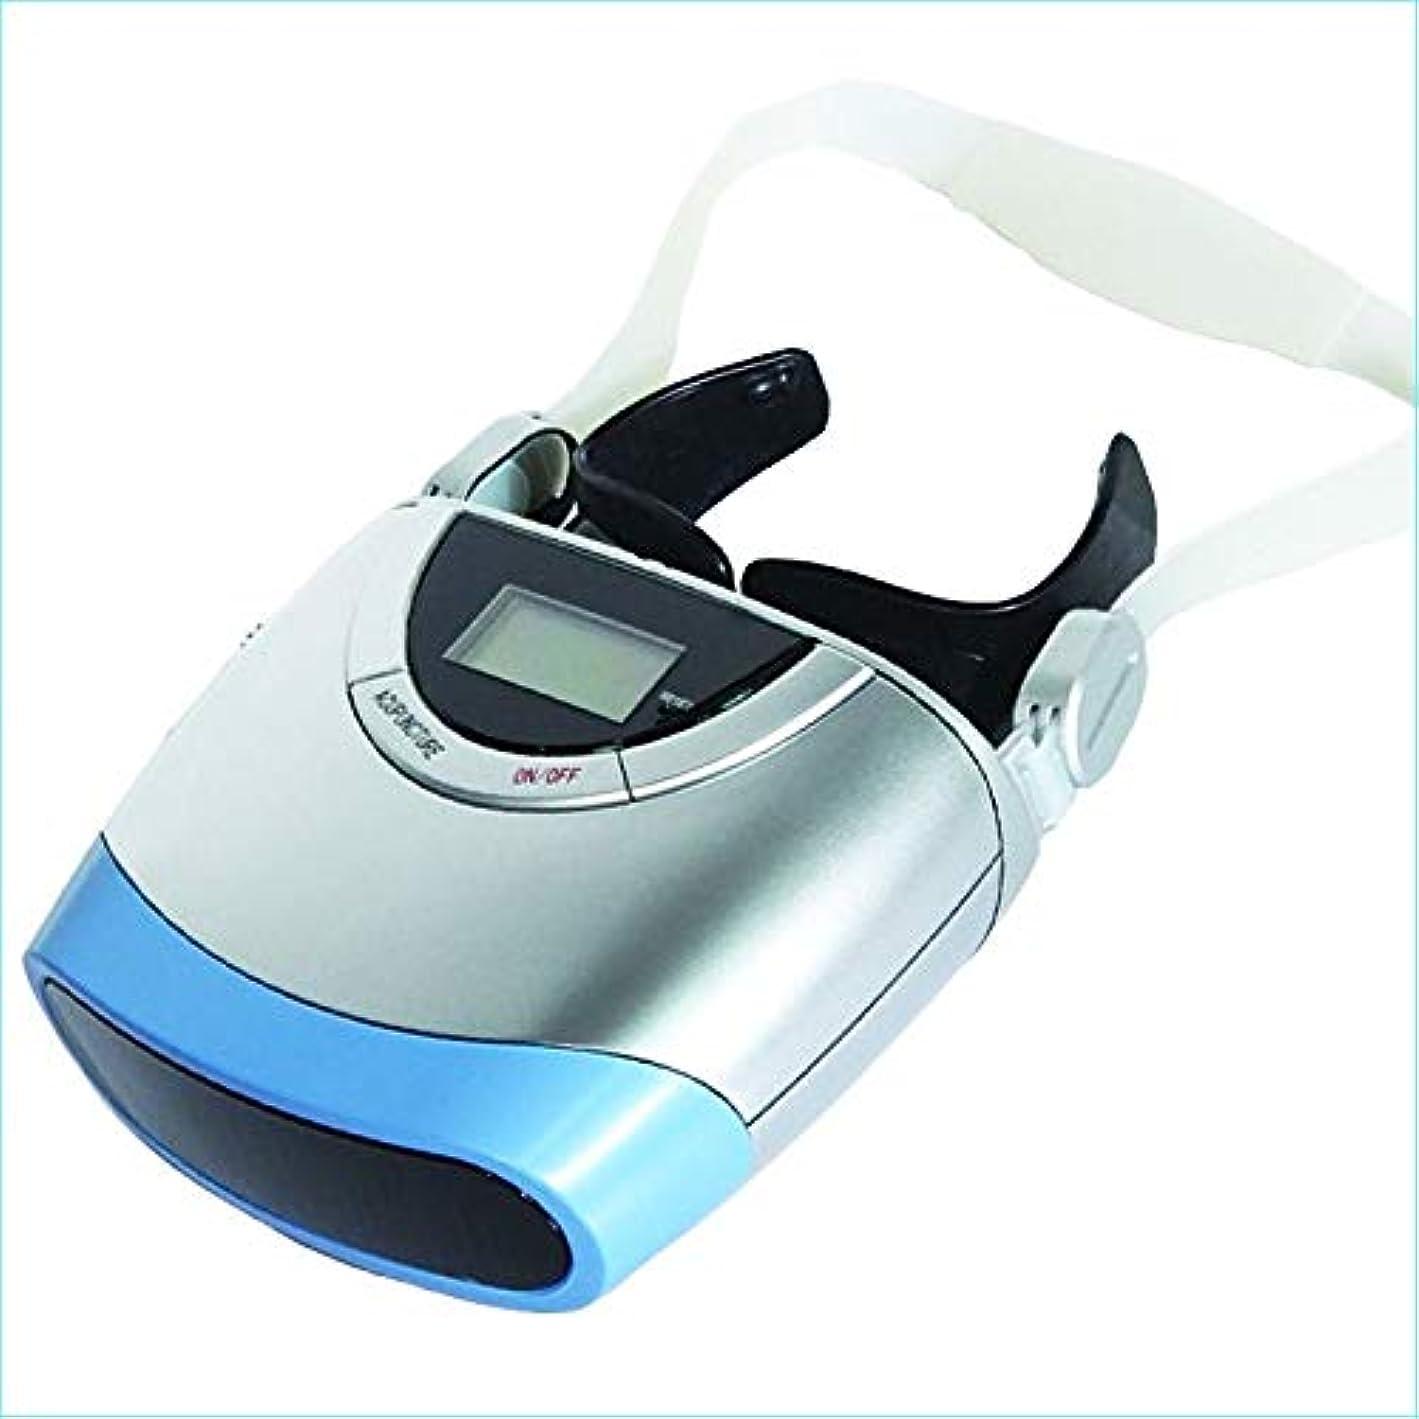 Meet now 近視用器具治療用3D視力回復装置、鍼レーザーアイマッサージャーII 品質保証